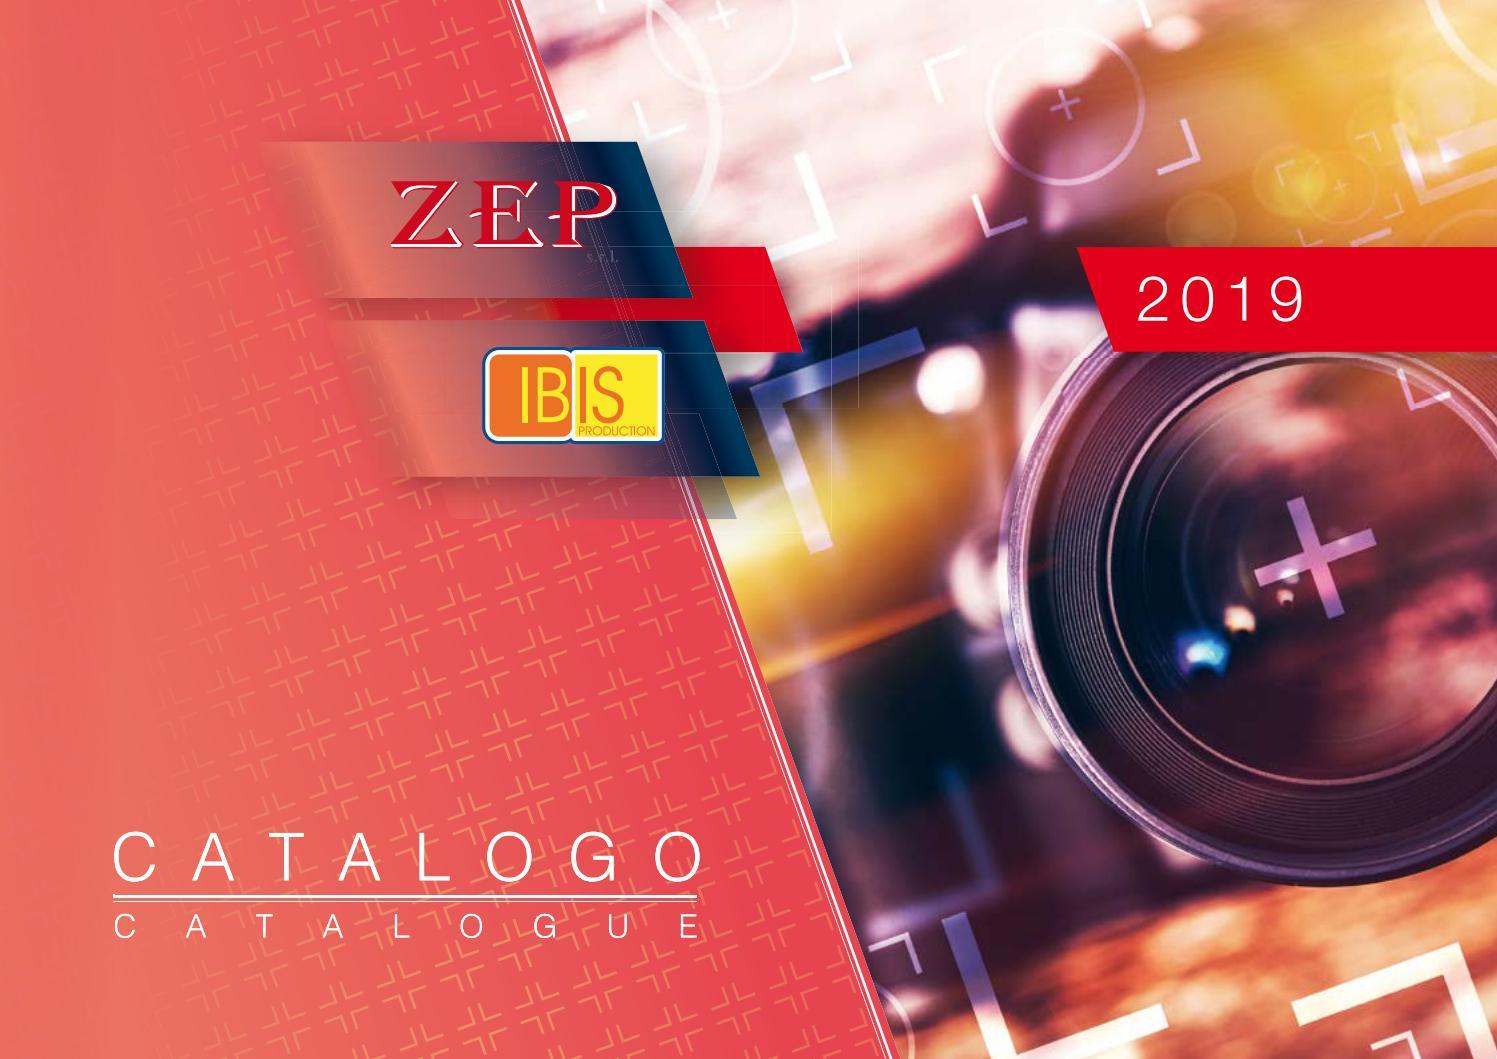 ZEP Caracas Cornice portafoto 37 x 22 x 4 cm Legno Rosso